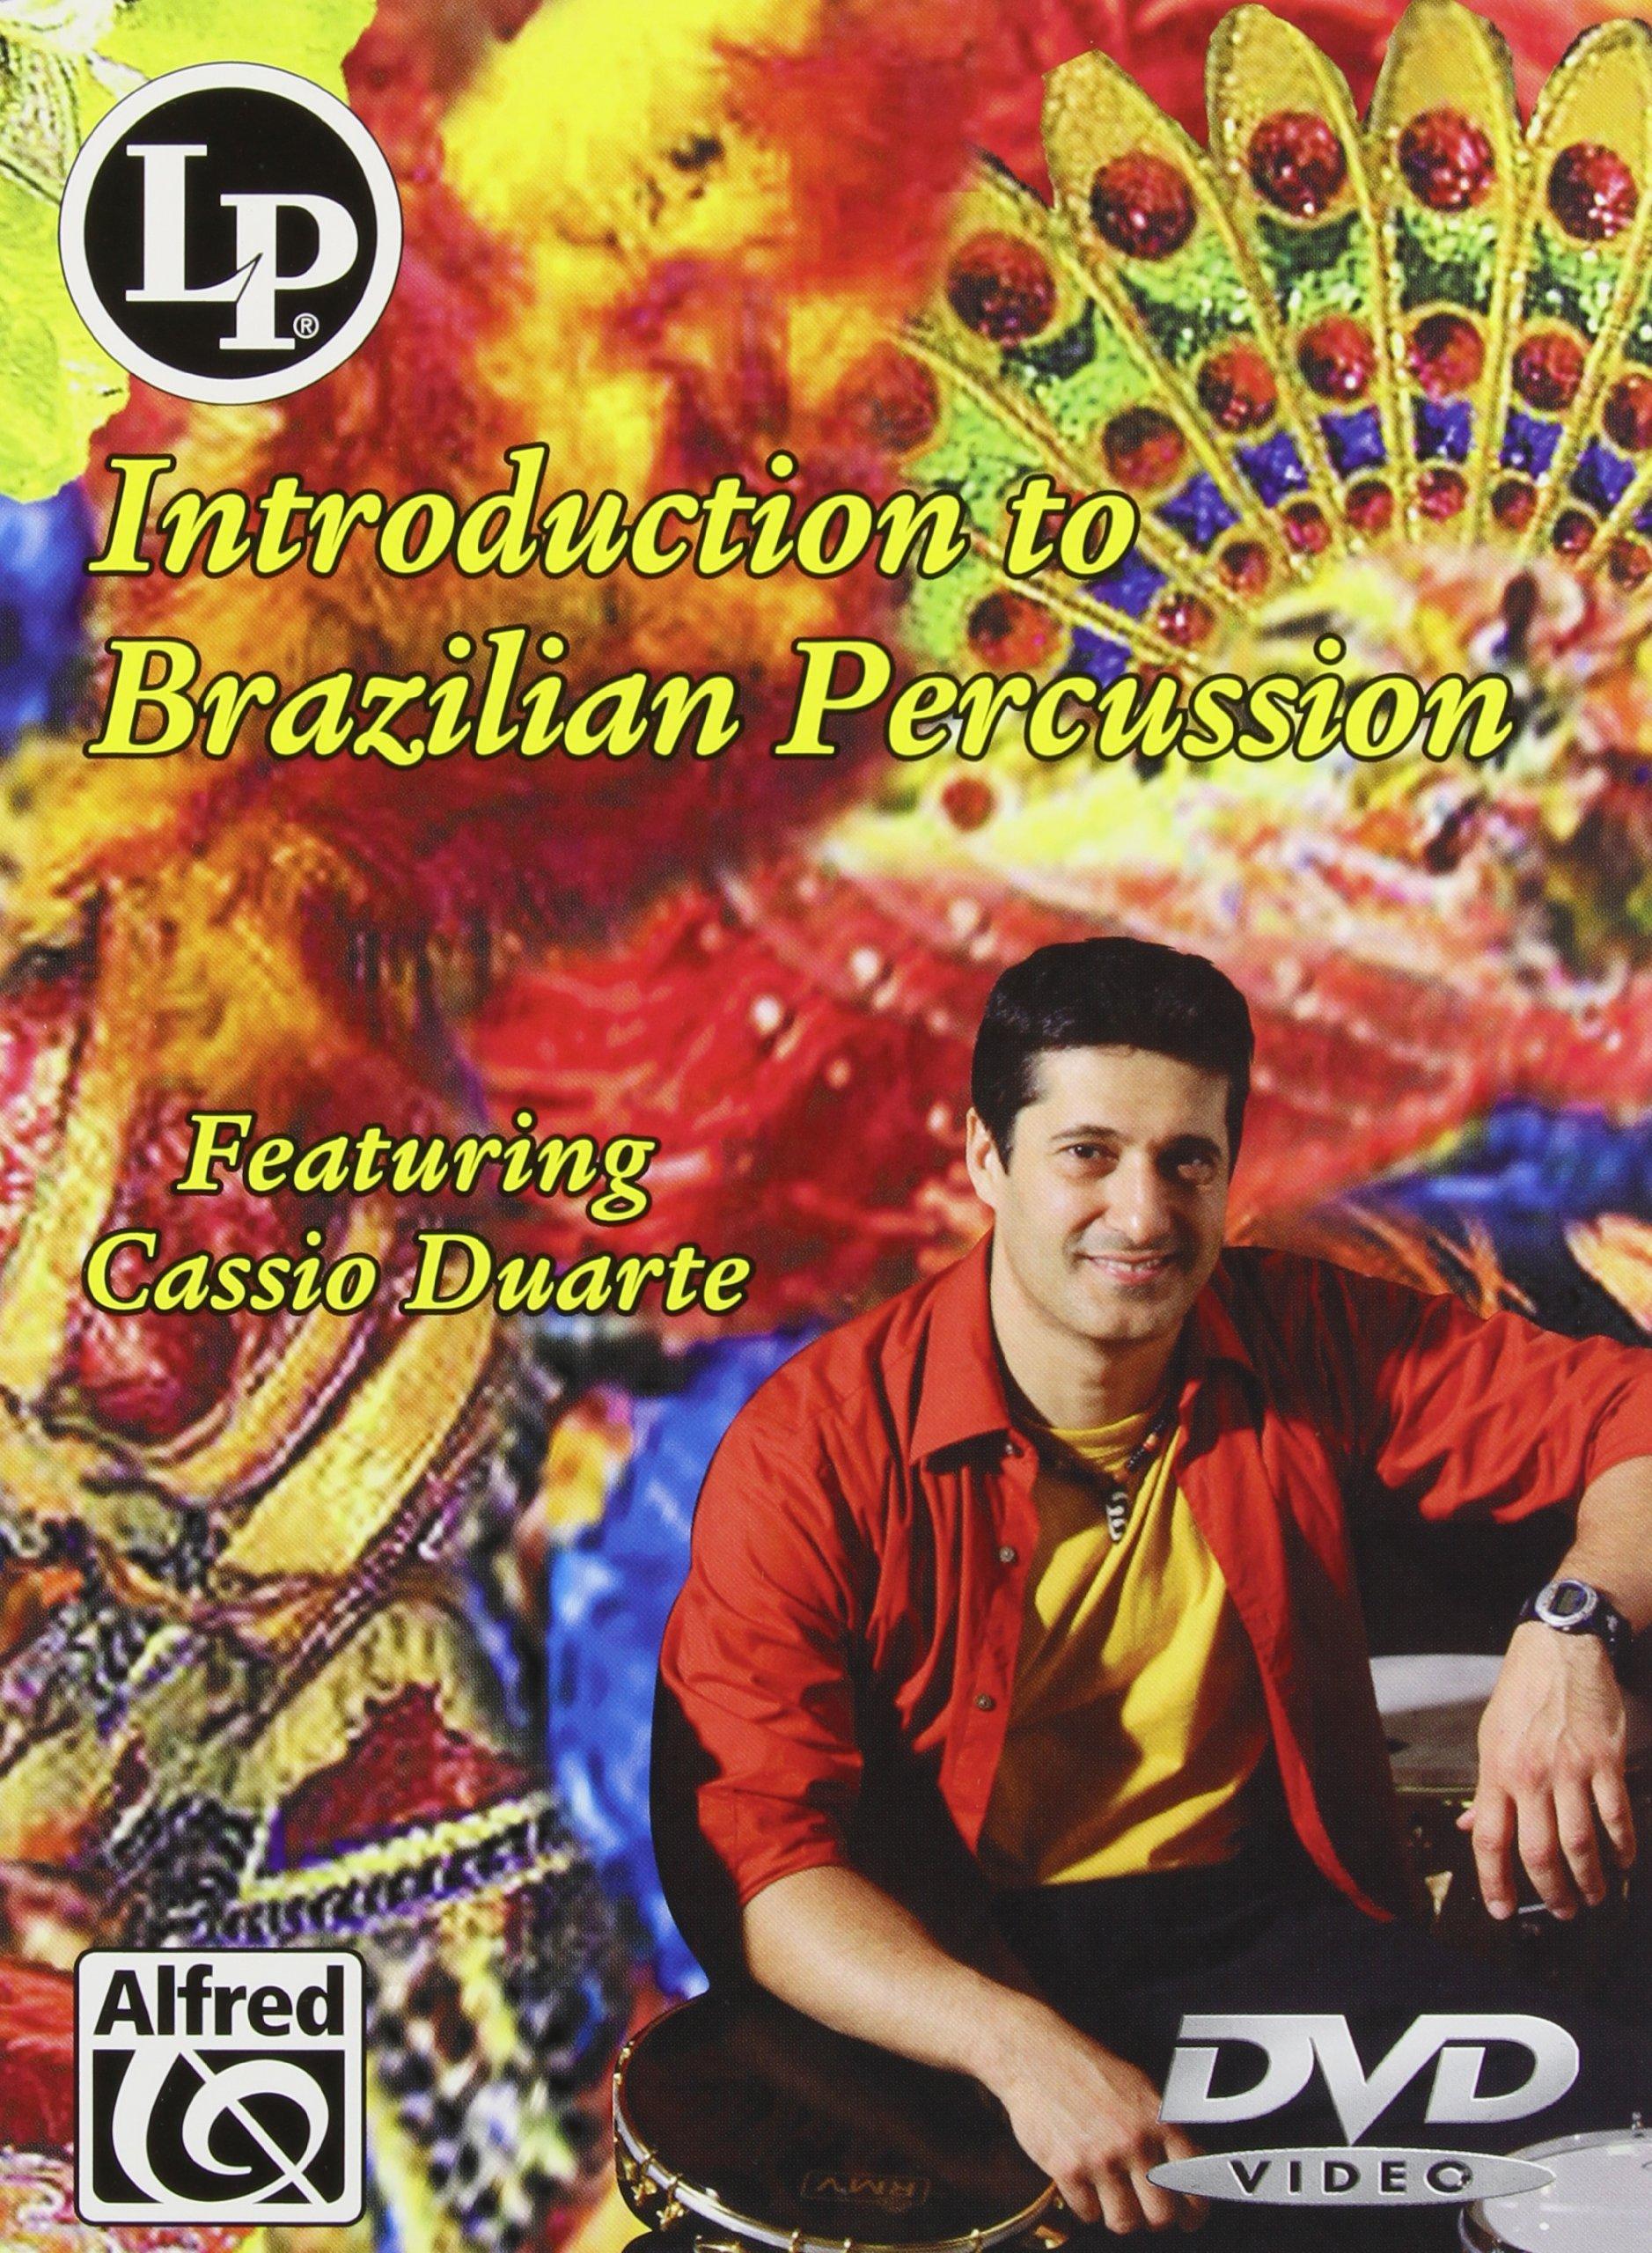 DVD : Cassio Duarte - Introduction To Brazilian Percussion (DVD)